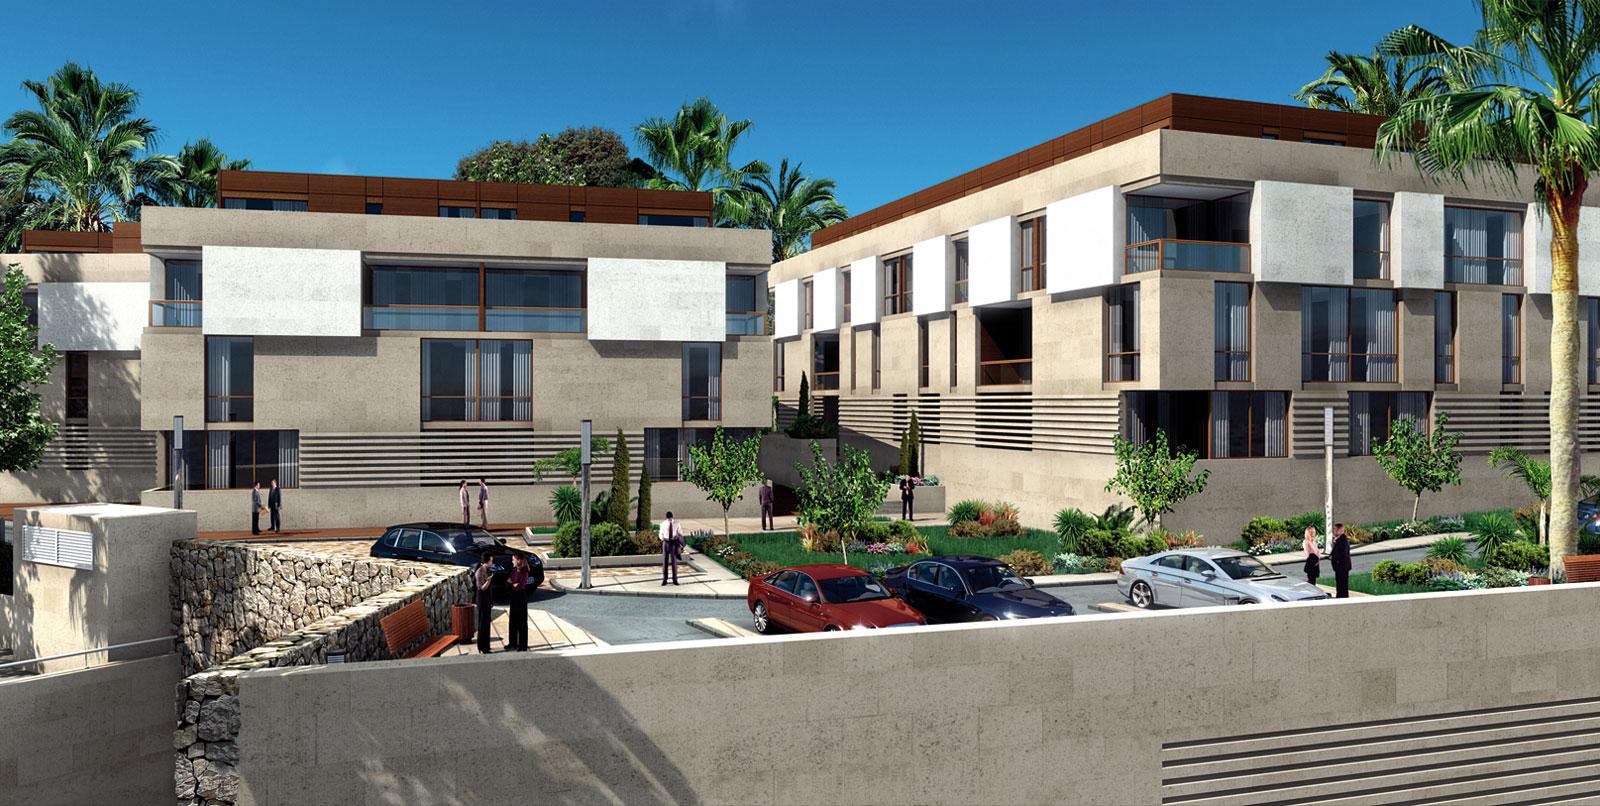 Projects es jonquet allende arquitectos - Arquitectos palma de mallorca ...